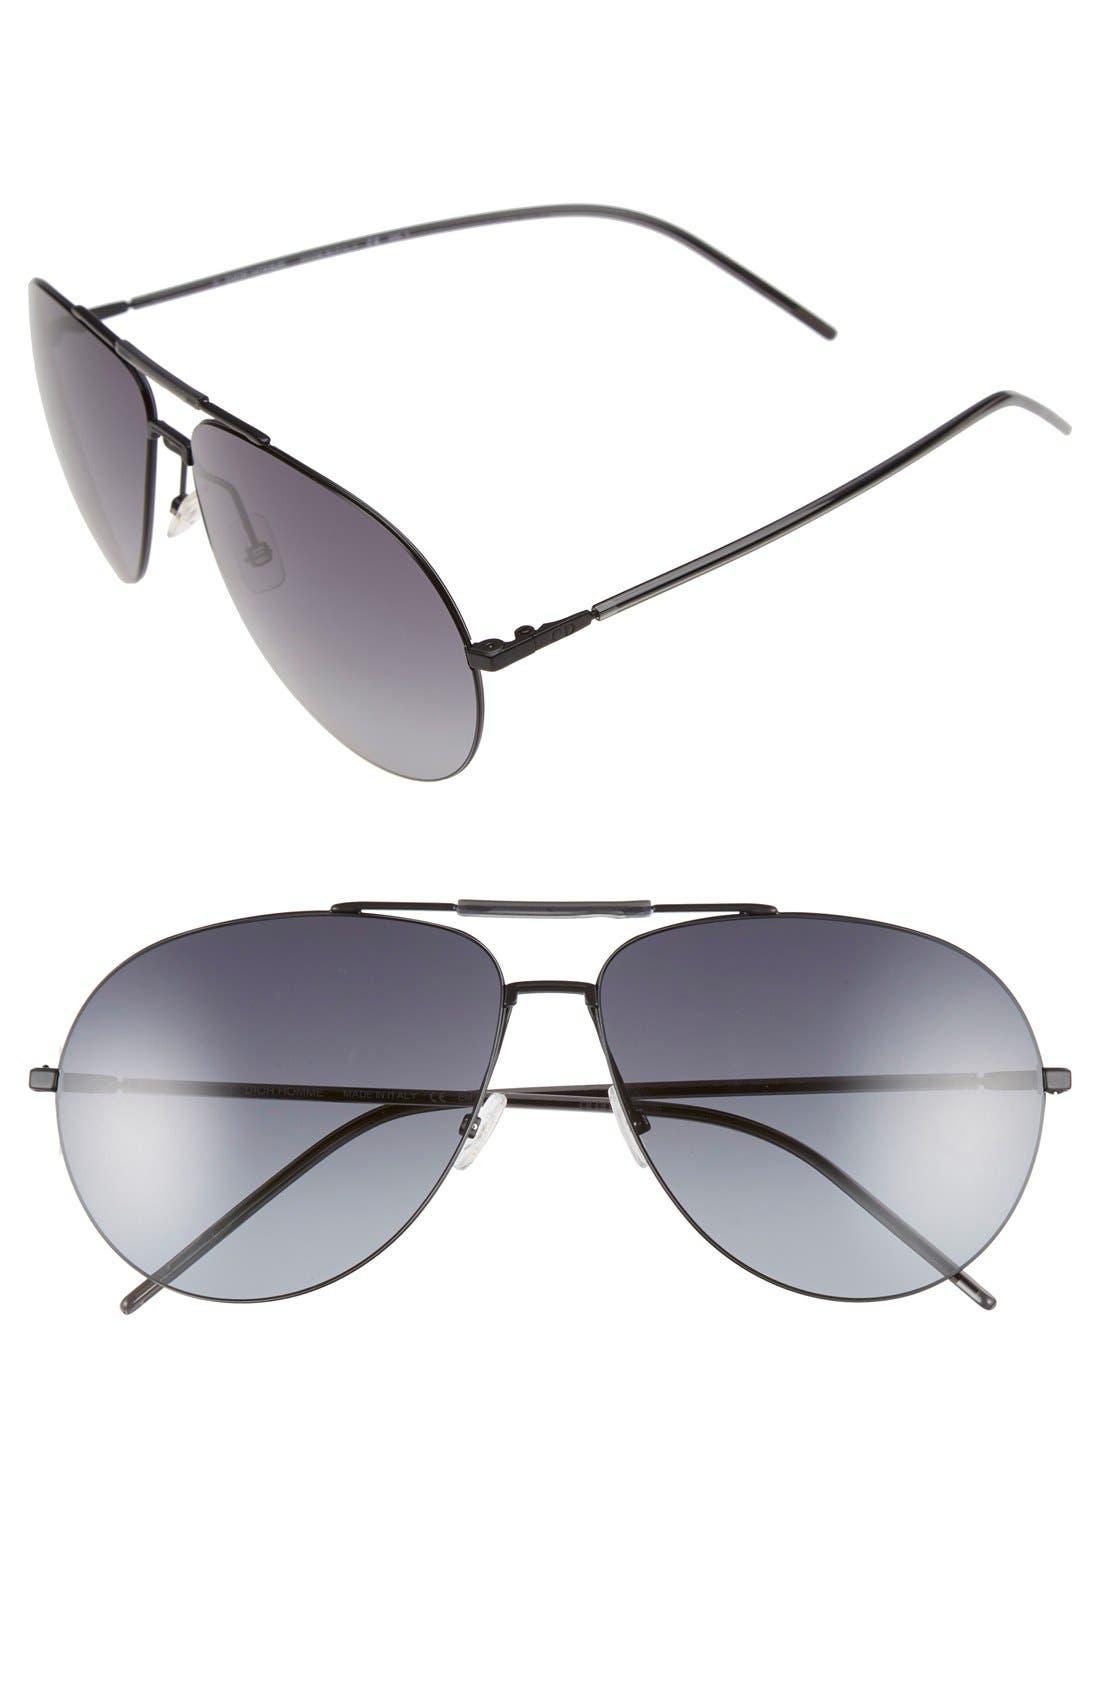 62mm Aviator Sunglasses,                         Main,                         color,